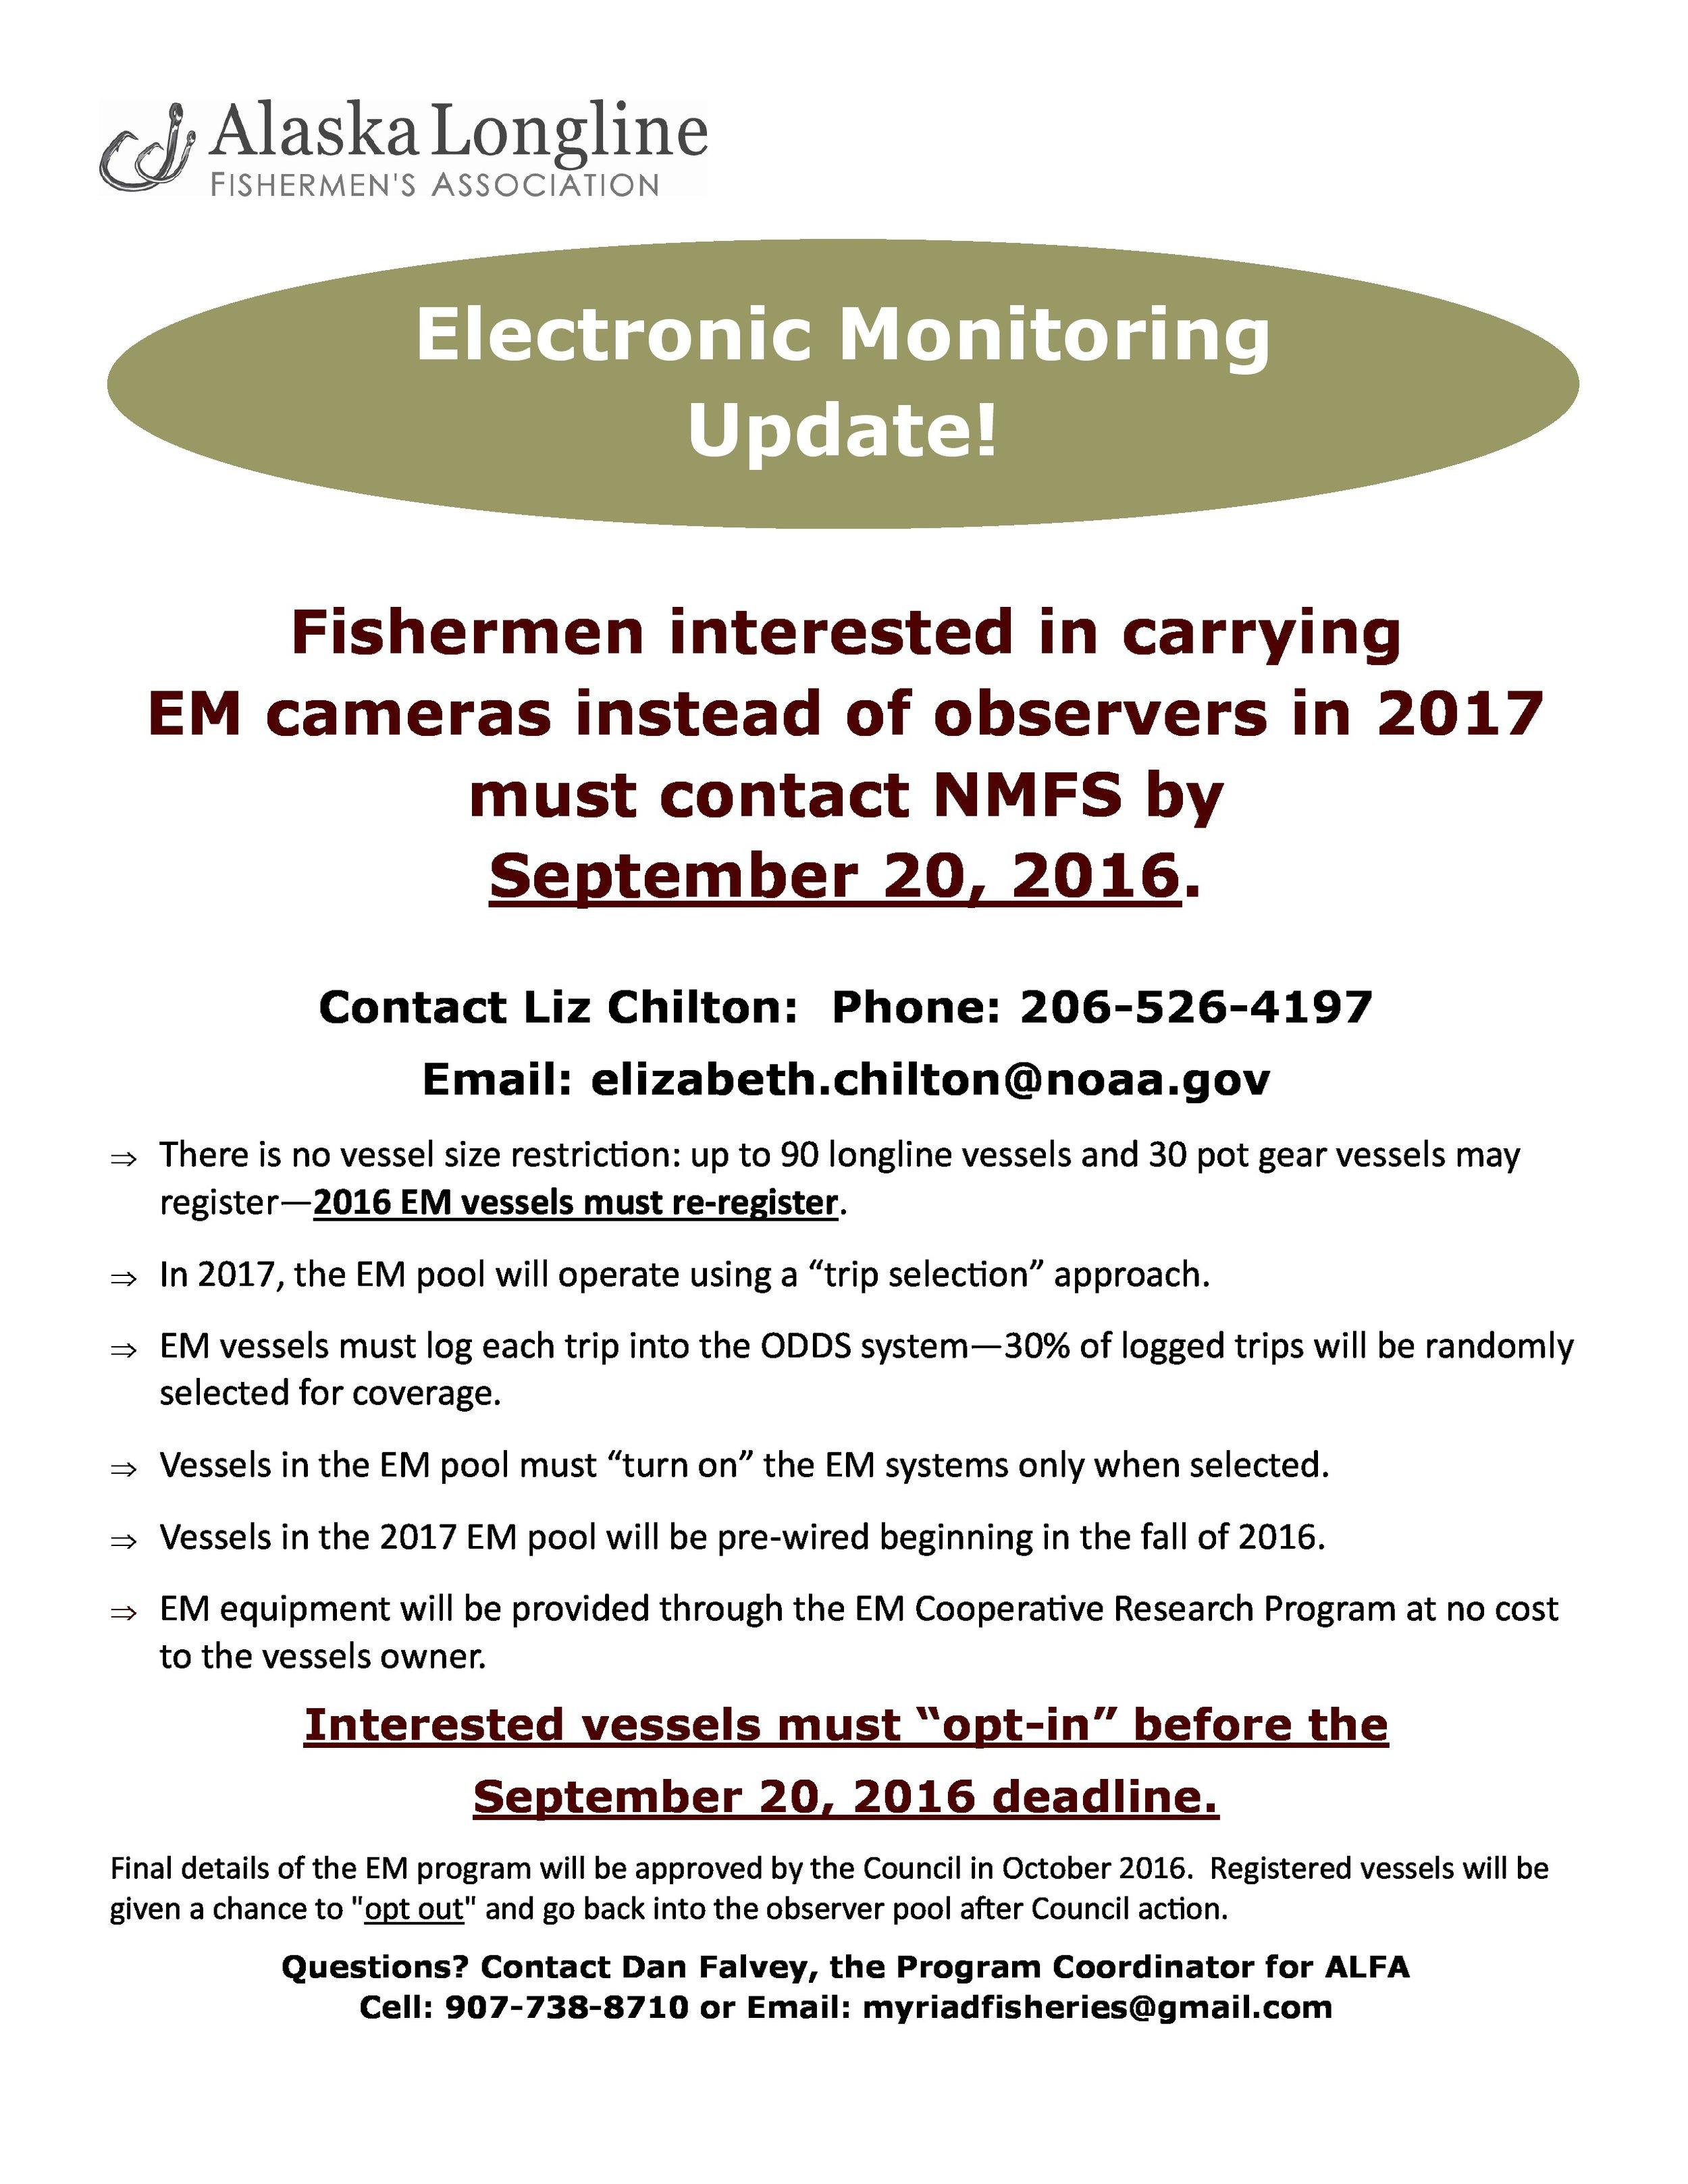 Electronic Monitoring Update